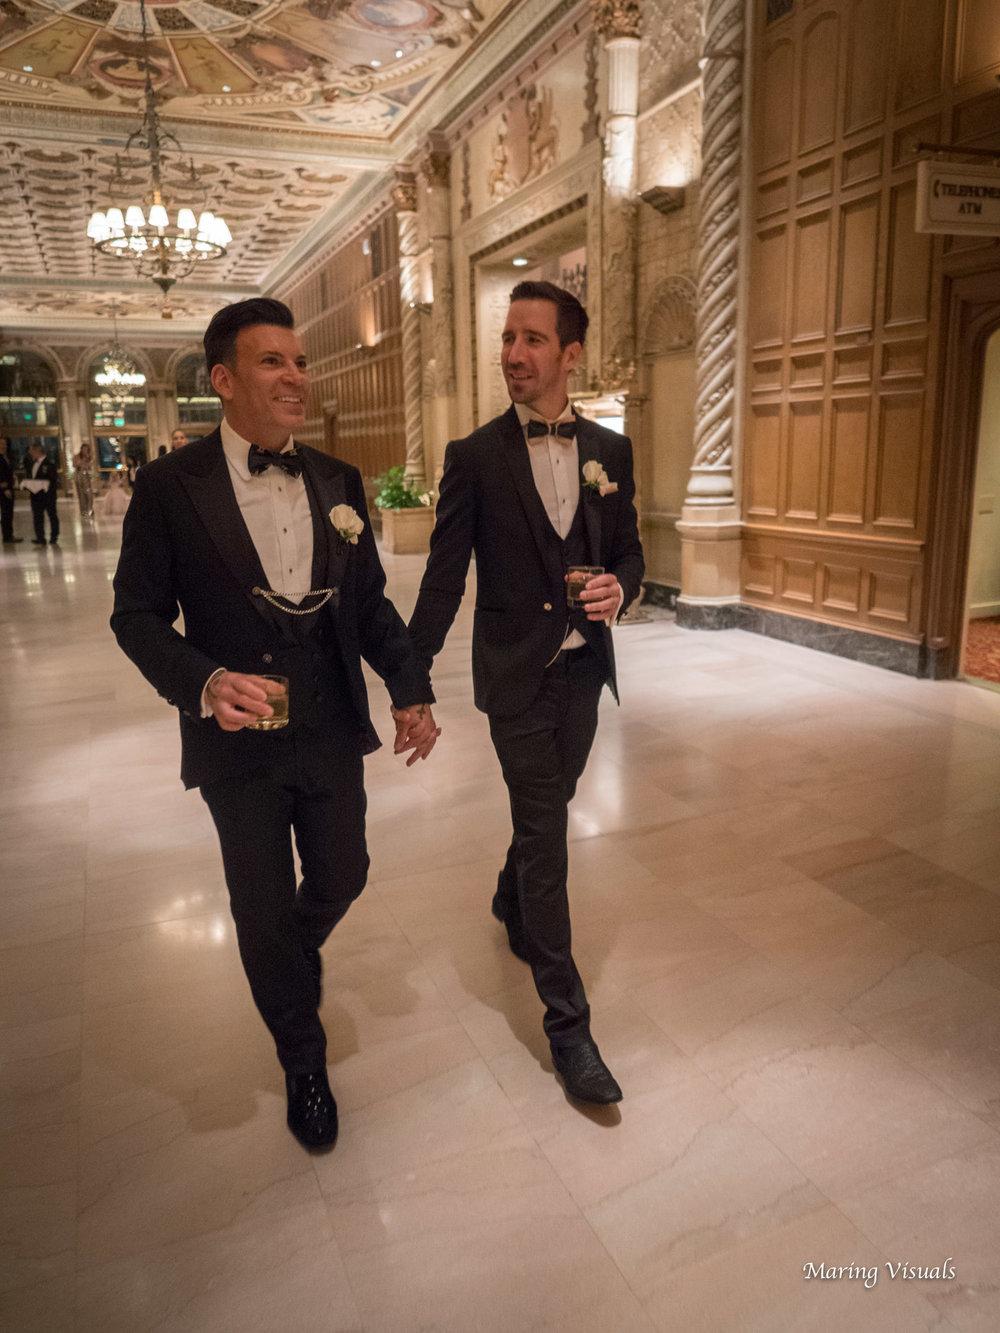 David Tutera Weddings by Maring Visuals 00551.jpg